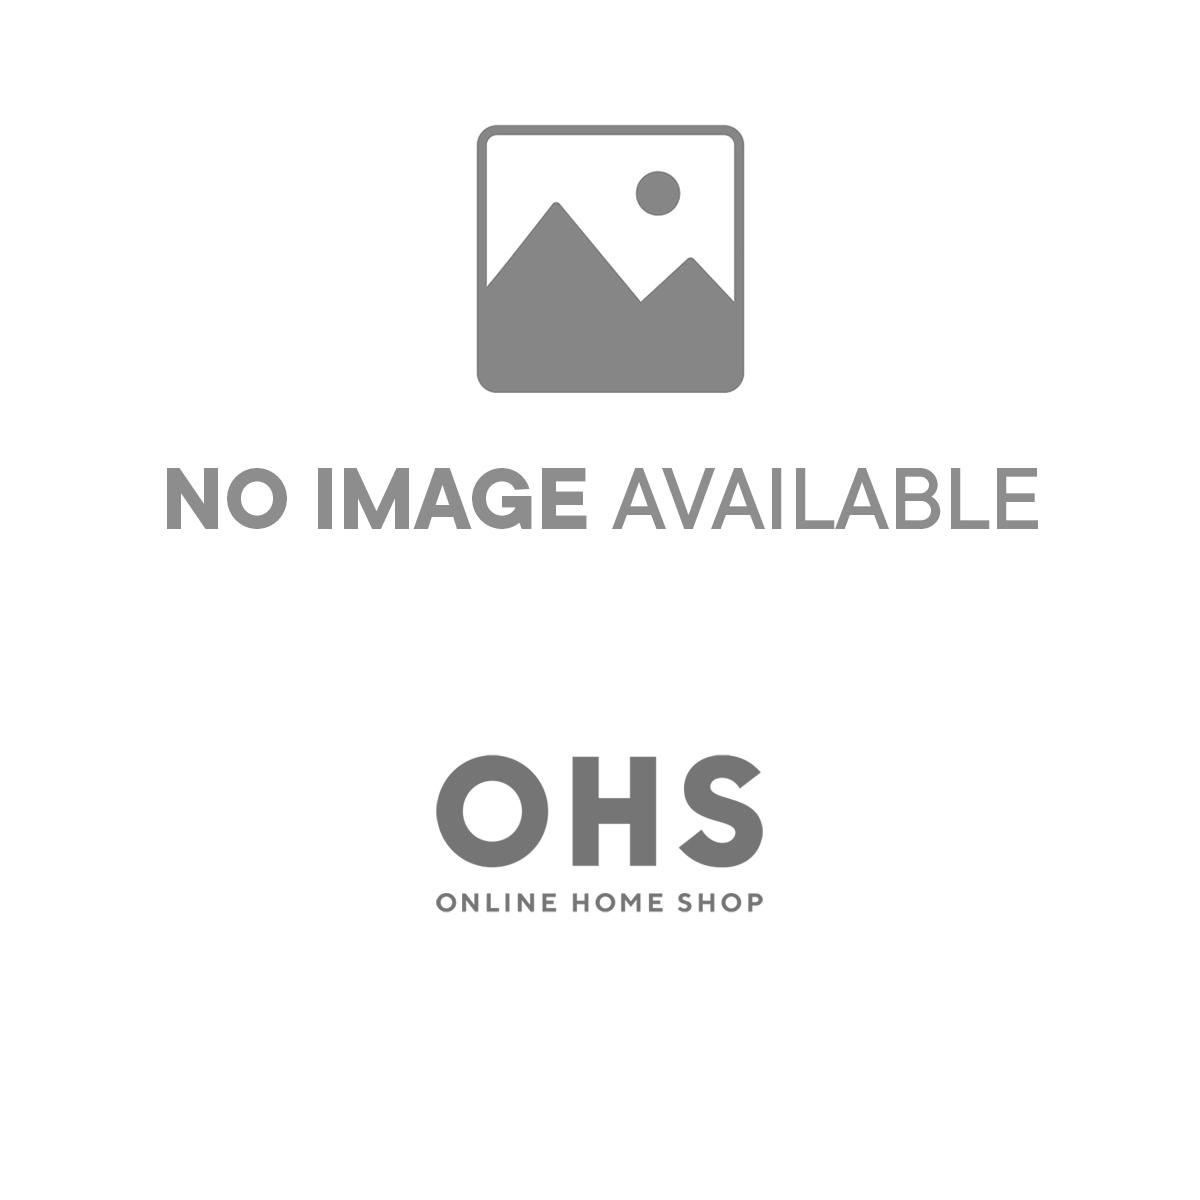 Highams 10 Piece Towel Bale Gift Sets 550 gsm - 100% Cotton - Blue